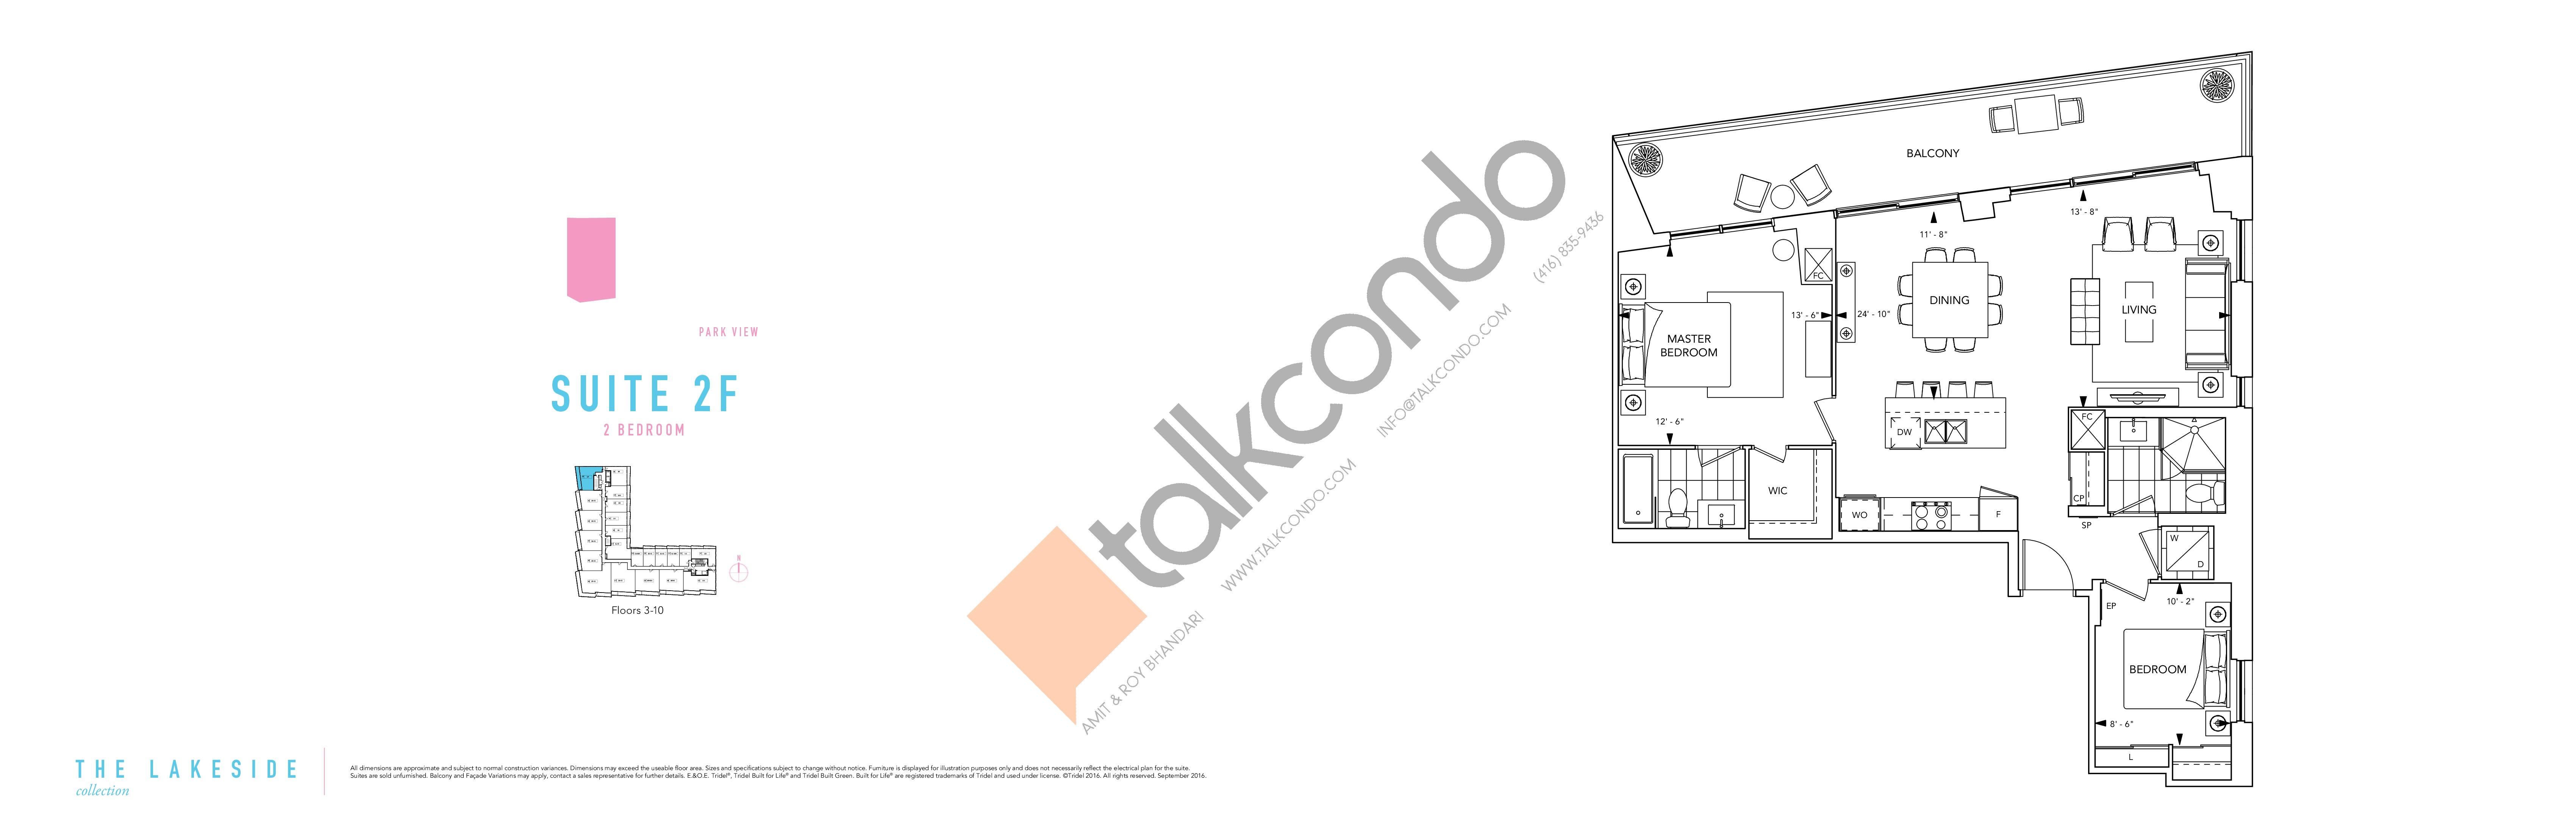 Suite 2F Floor Plan at Aquabella Condos - 1057 sq.ft